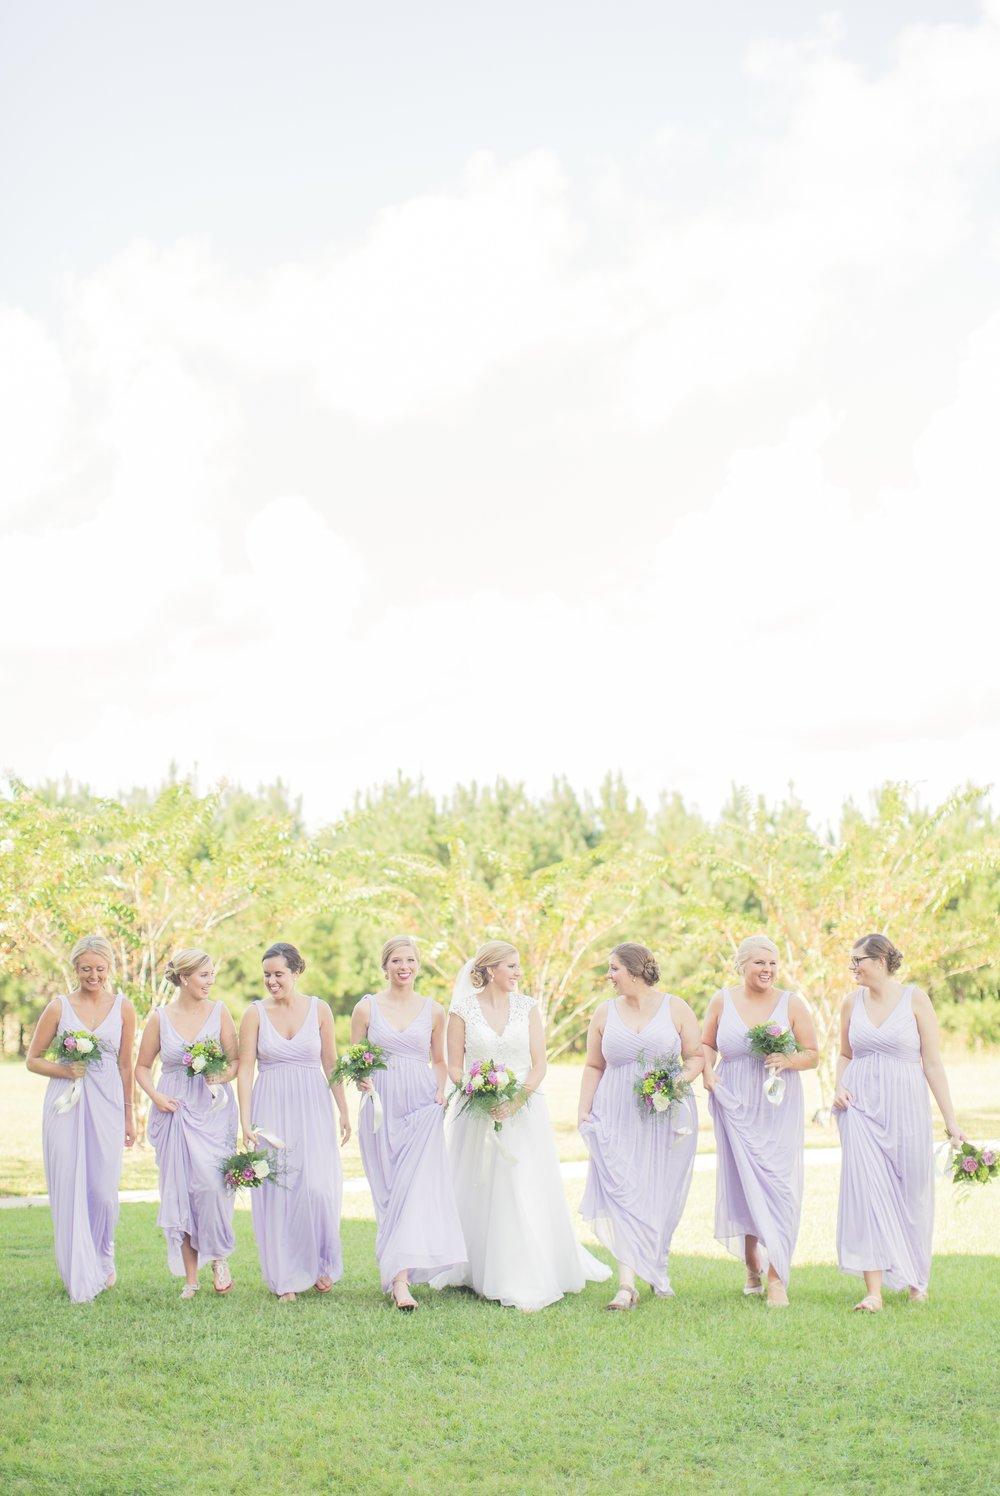 meridian-mississippi-outdoor-fall-wedding 29.jpg